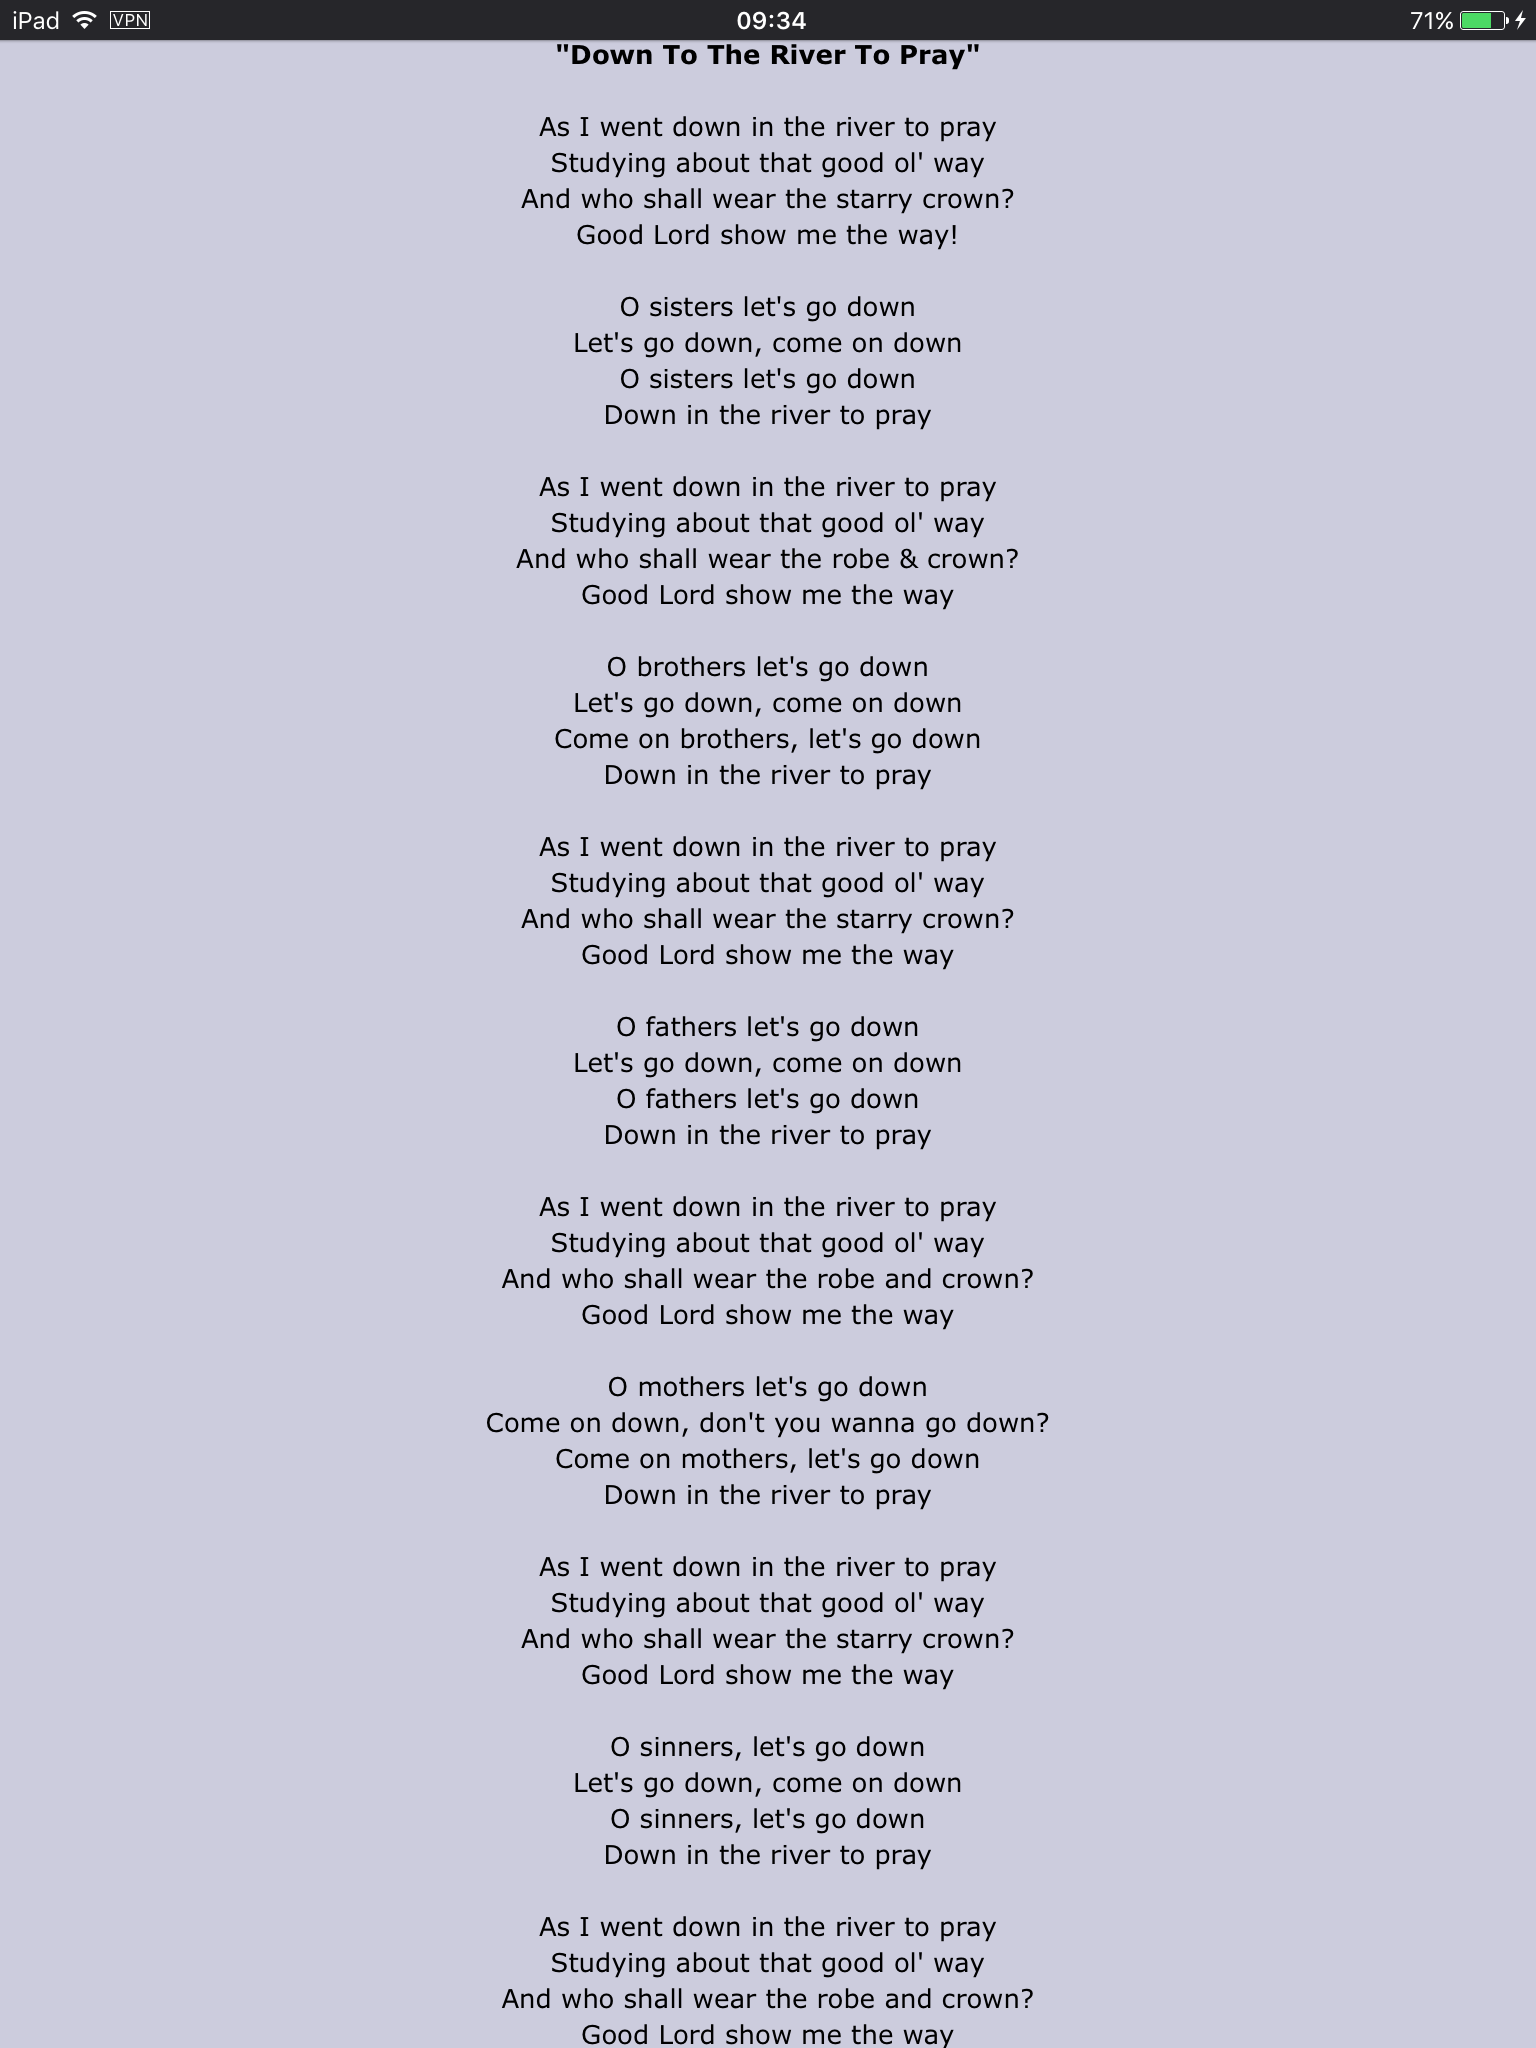 Robbie Williams Songtexte Songtexte Om Gitarre Engel